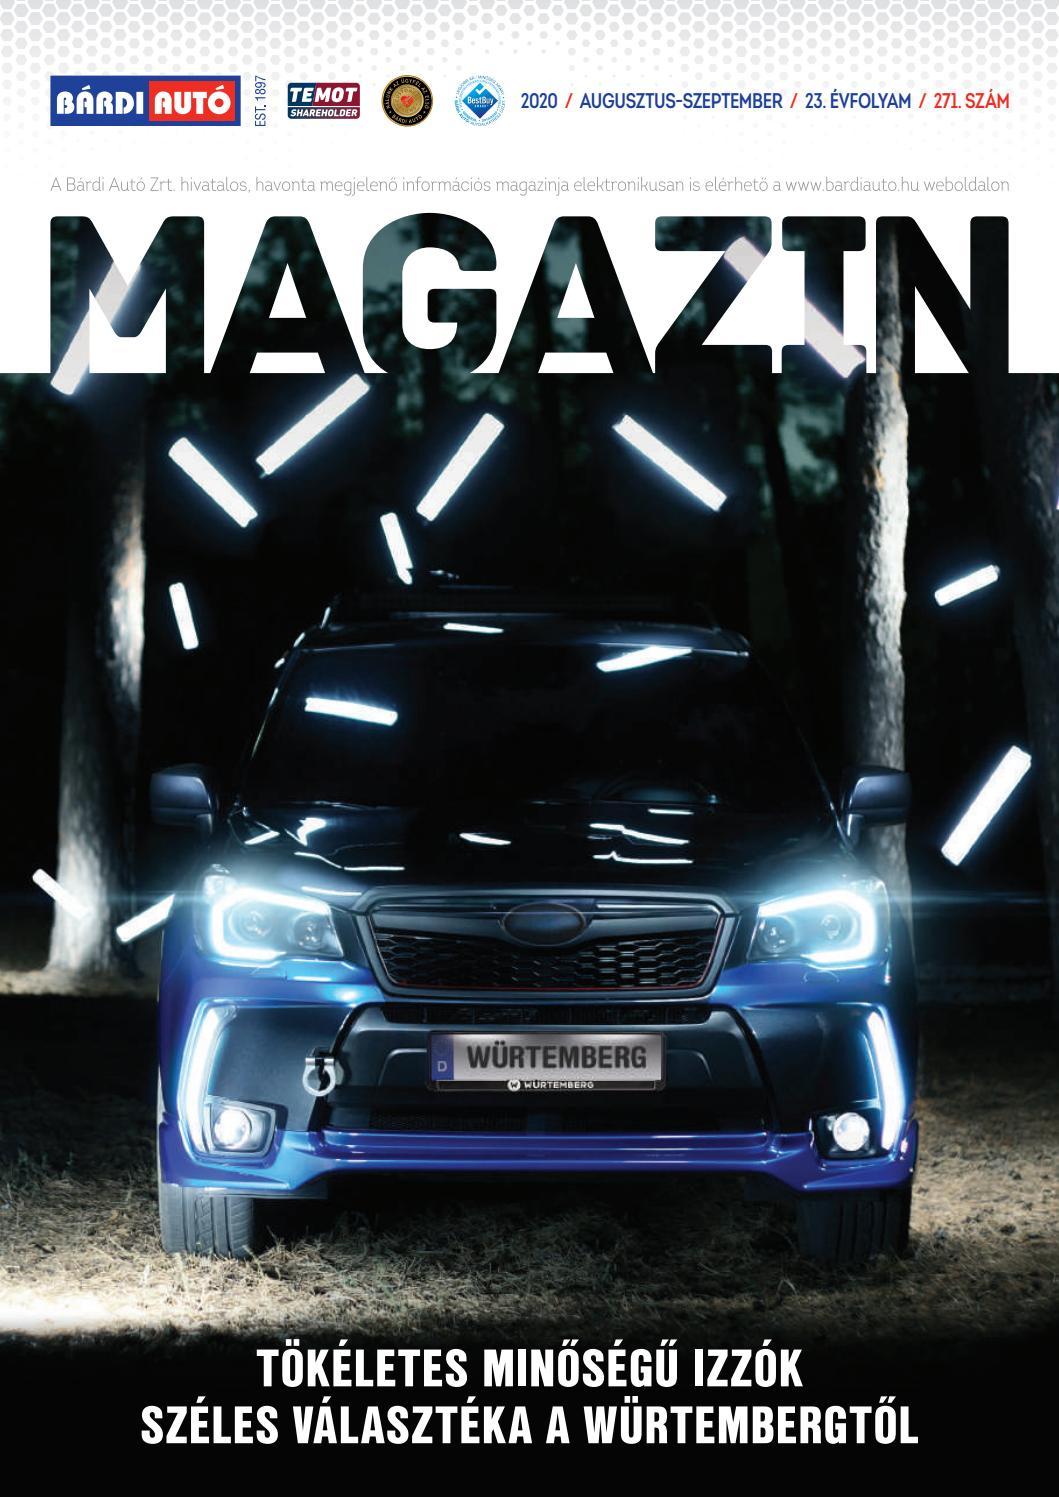 Bardi Auto Magazin Tokeletes Minosegu Izzok Szeles Valaszteka A Wurtembergtol By Bardiauto Issuu